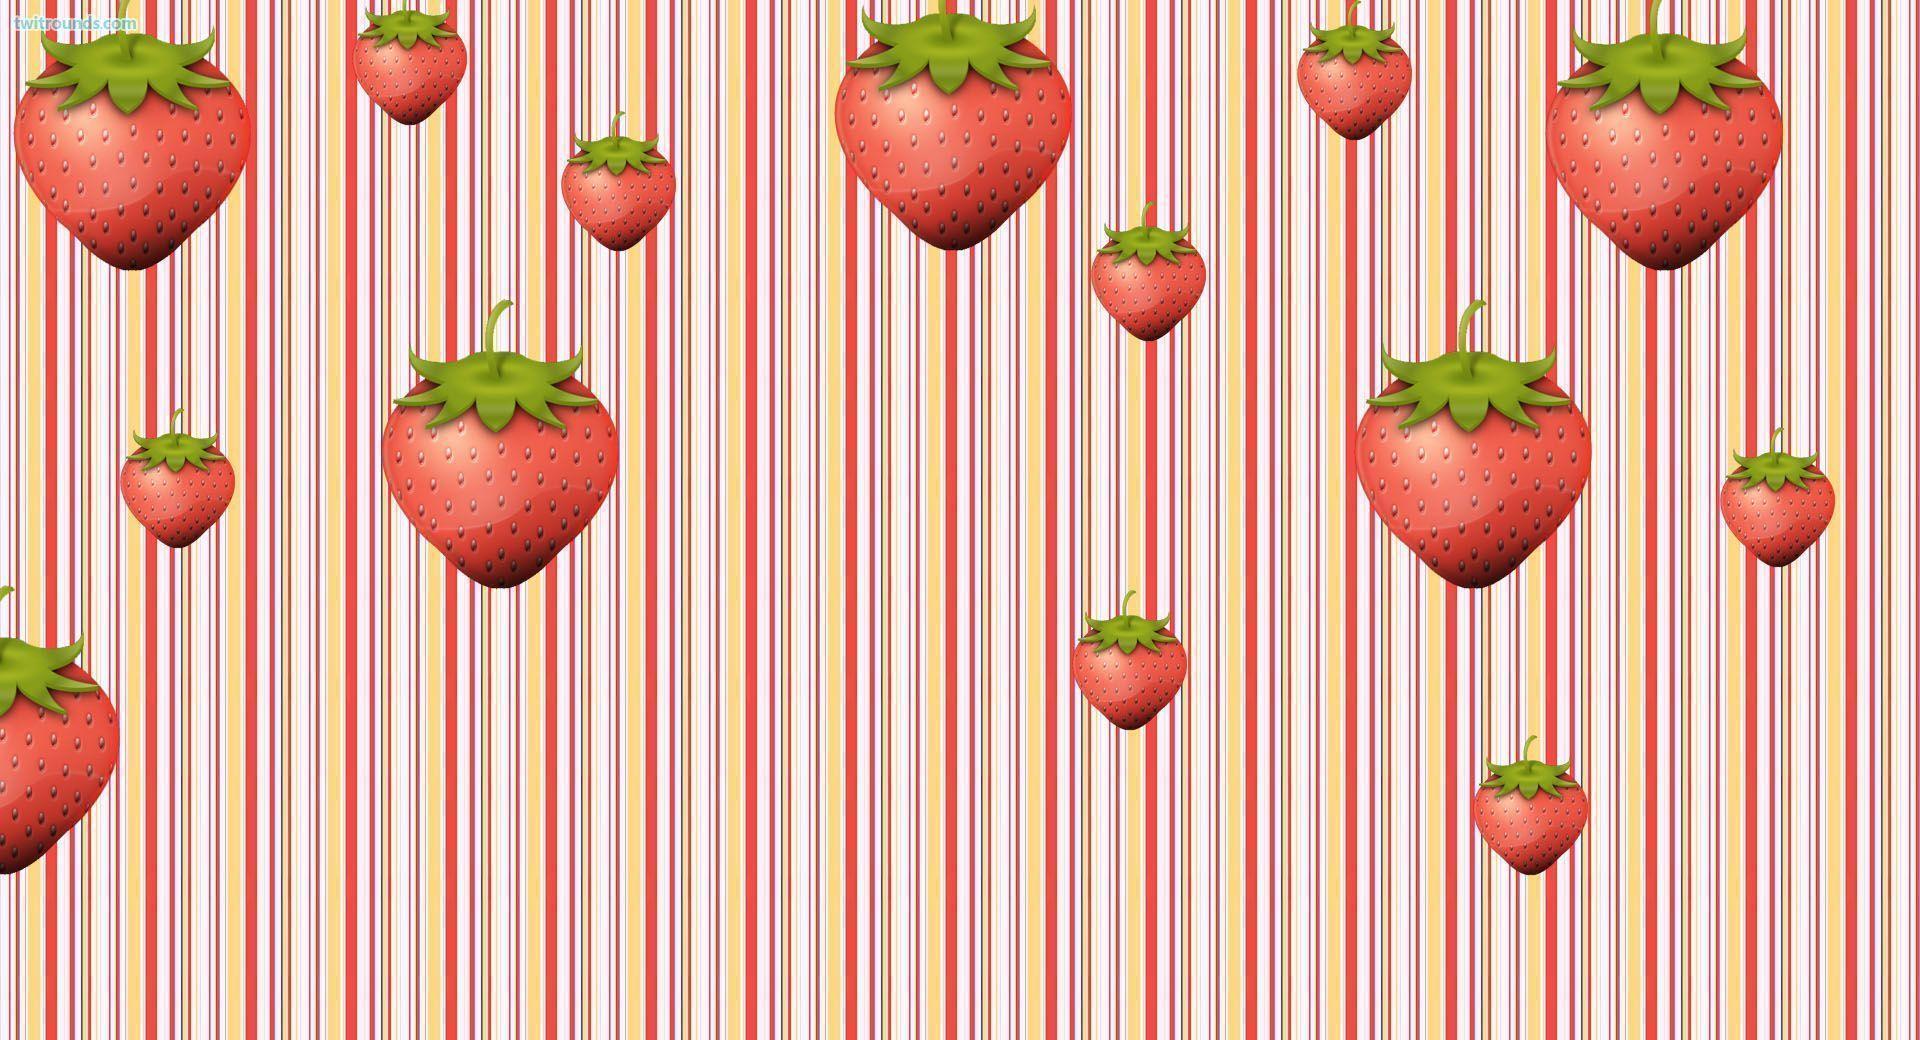 Strawberry Shortcake Backgrounds - Wallpaper Cave  Vintage Strawberry Shortcake Wallpaper